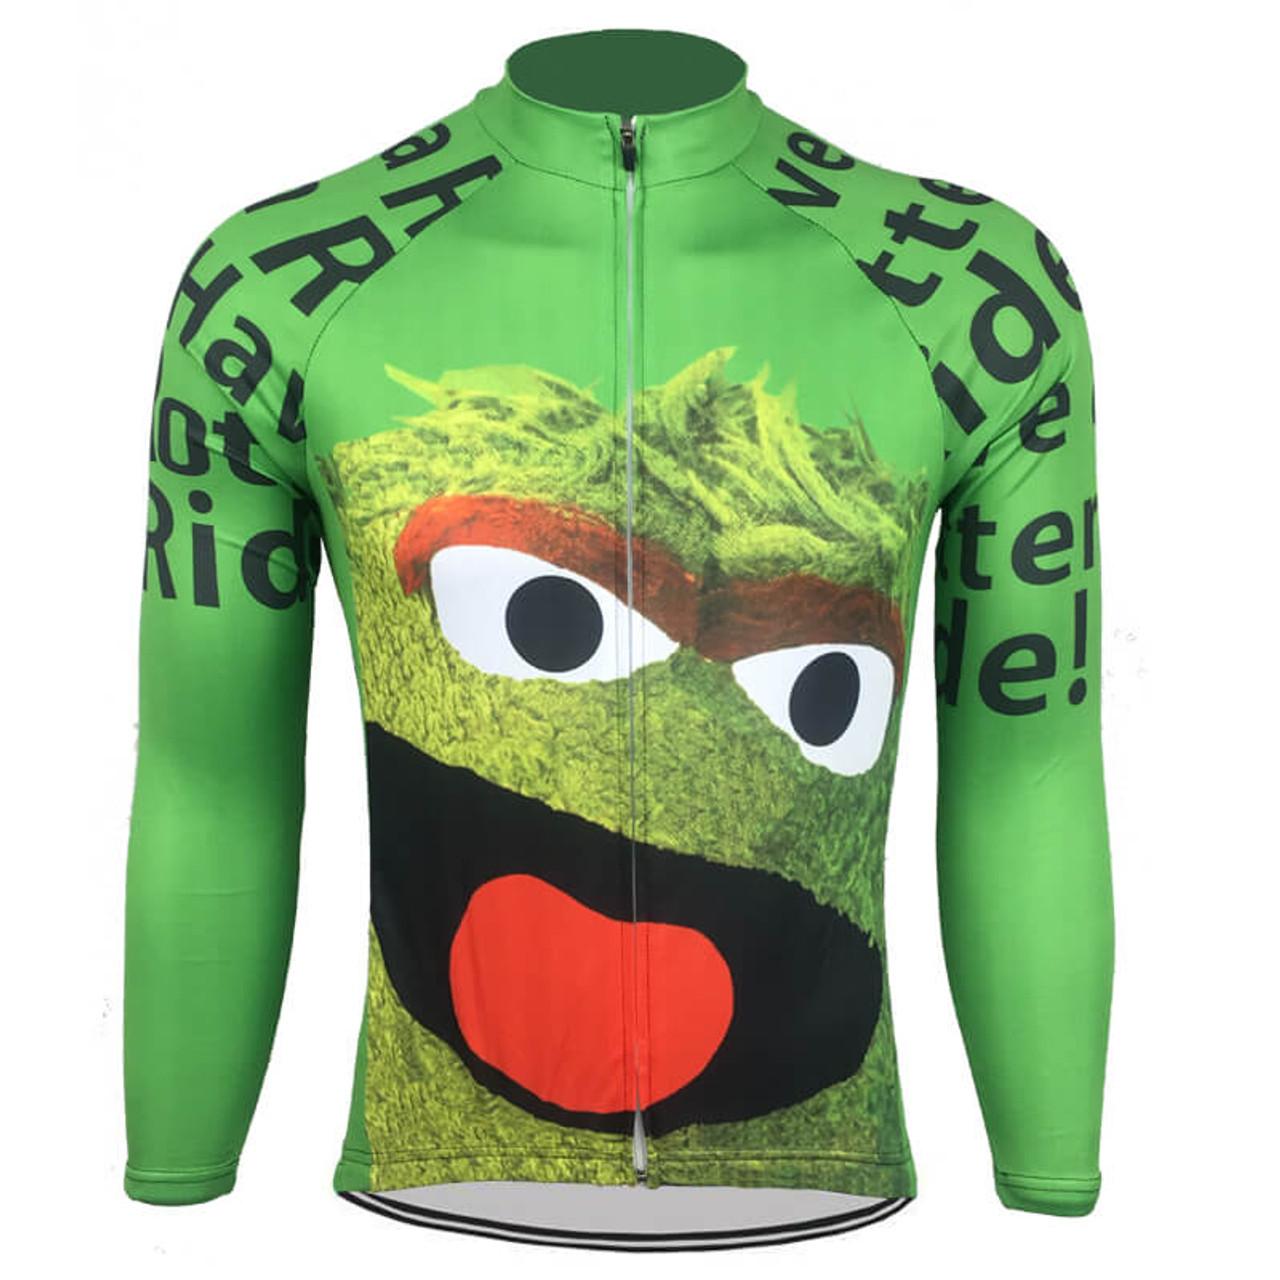 Oscar The Grouch Sesame Street Long Sleeve Cycling Jersey